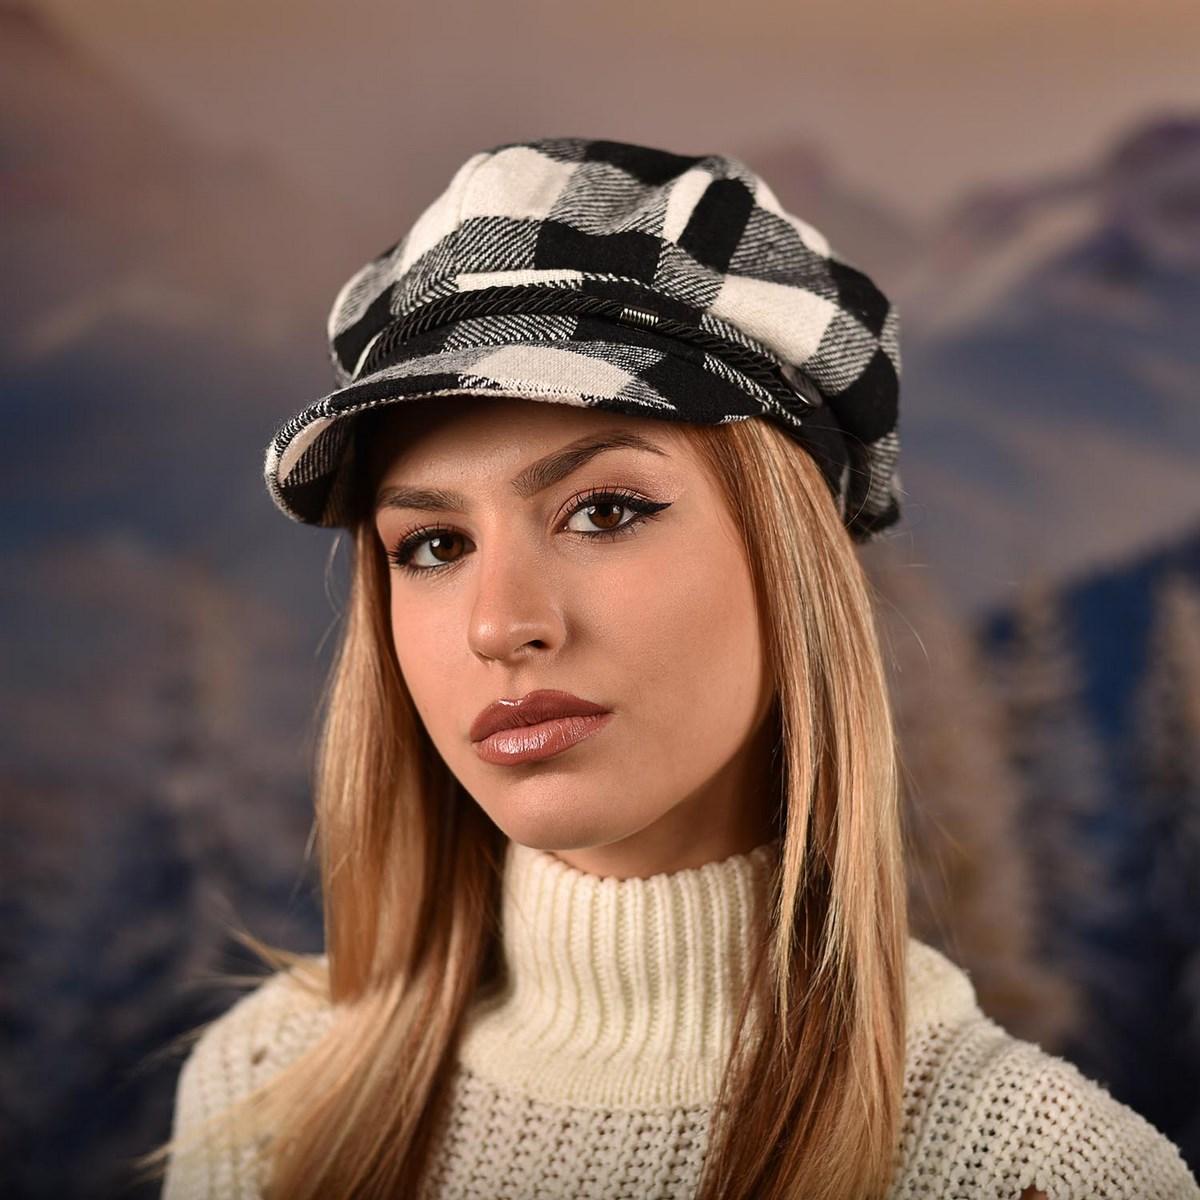 Дамска Зимна Барета Бяло и черно